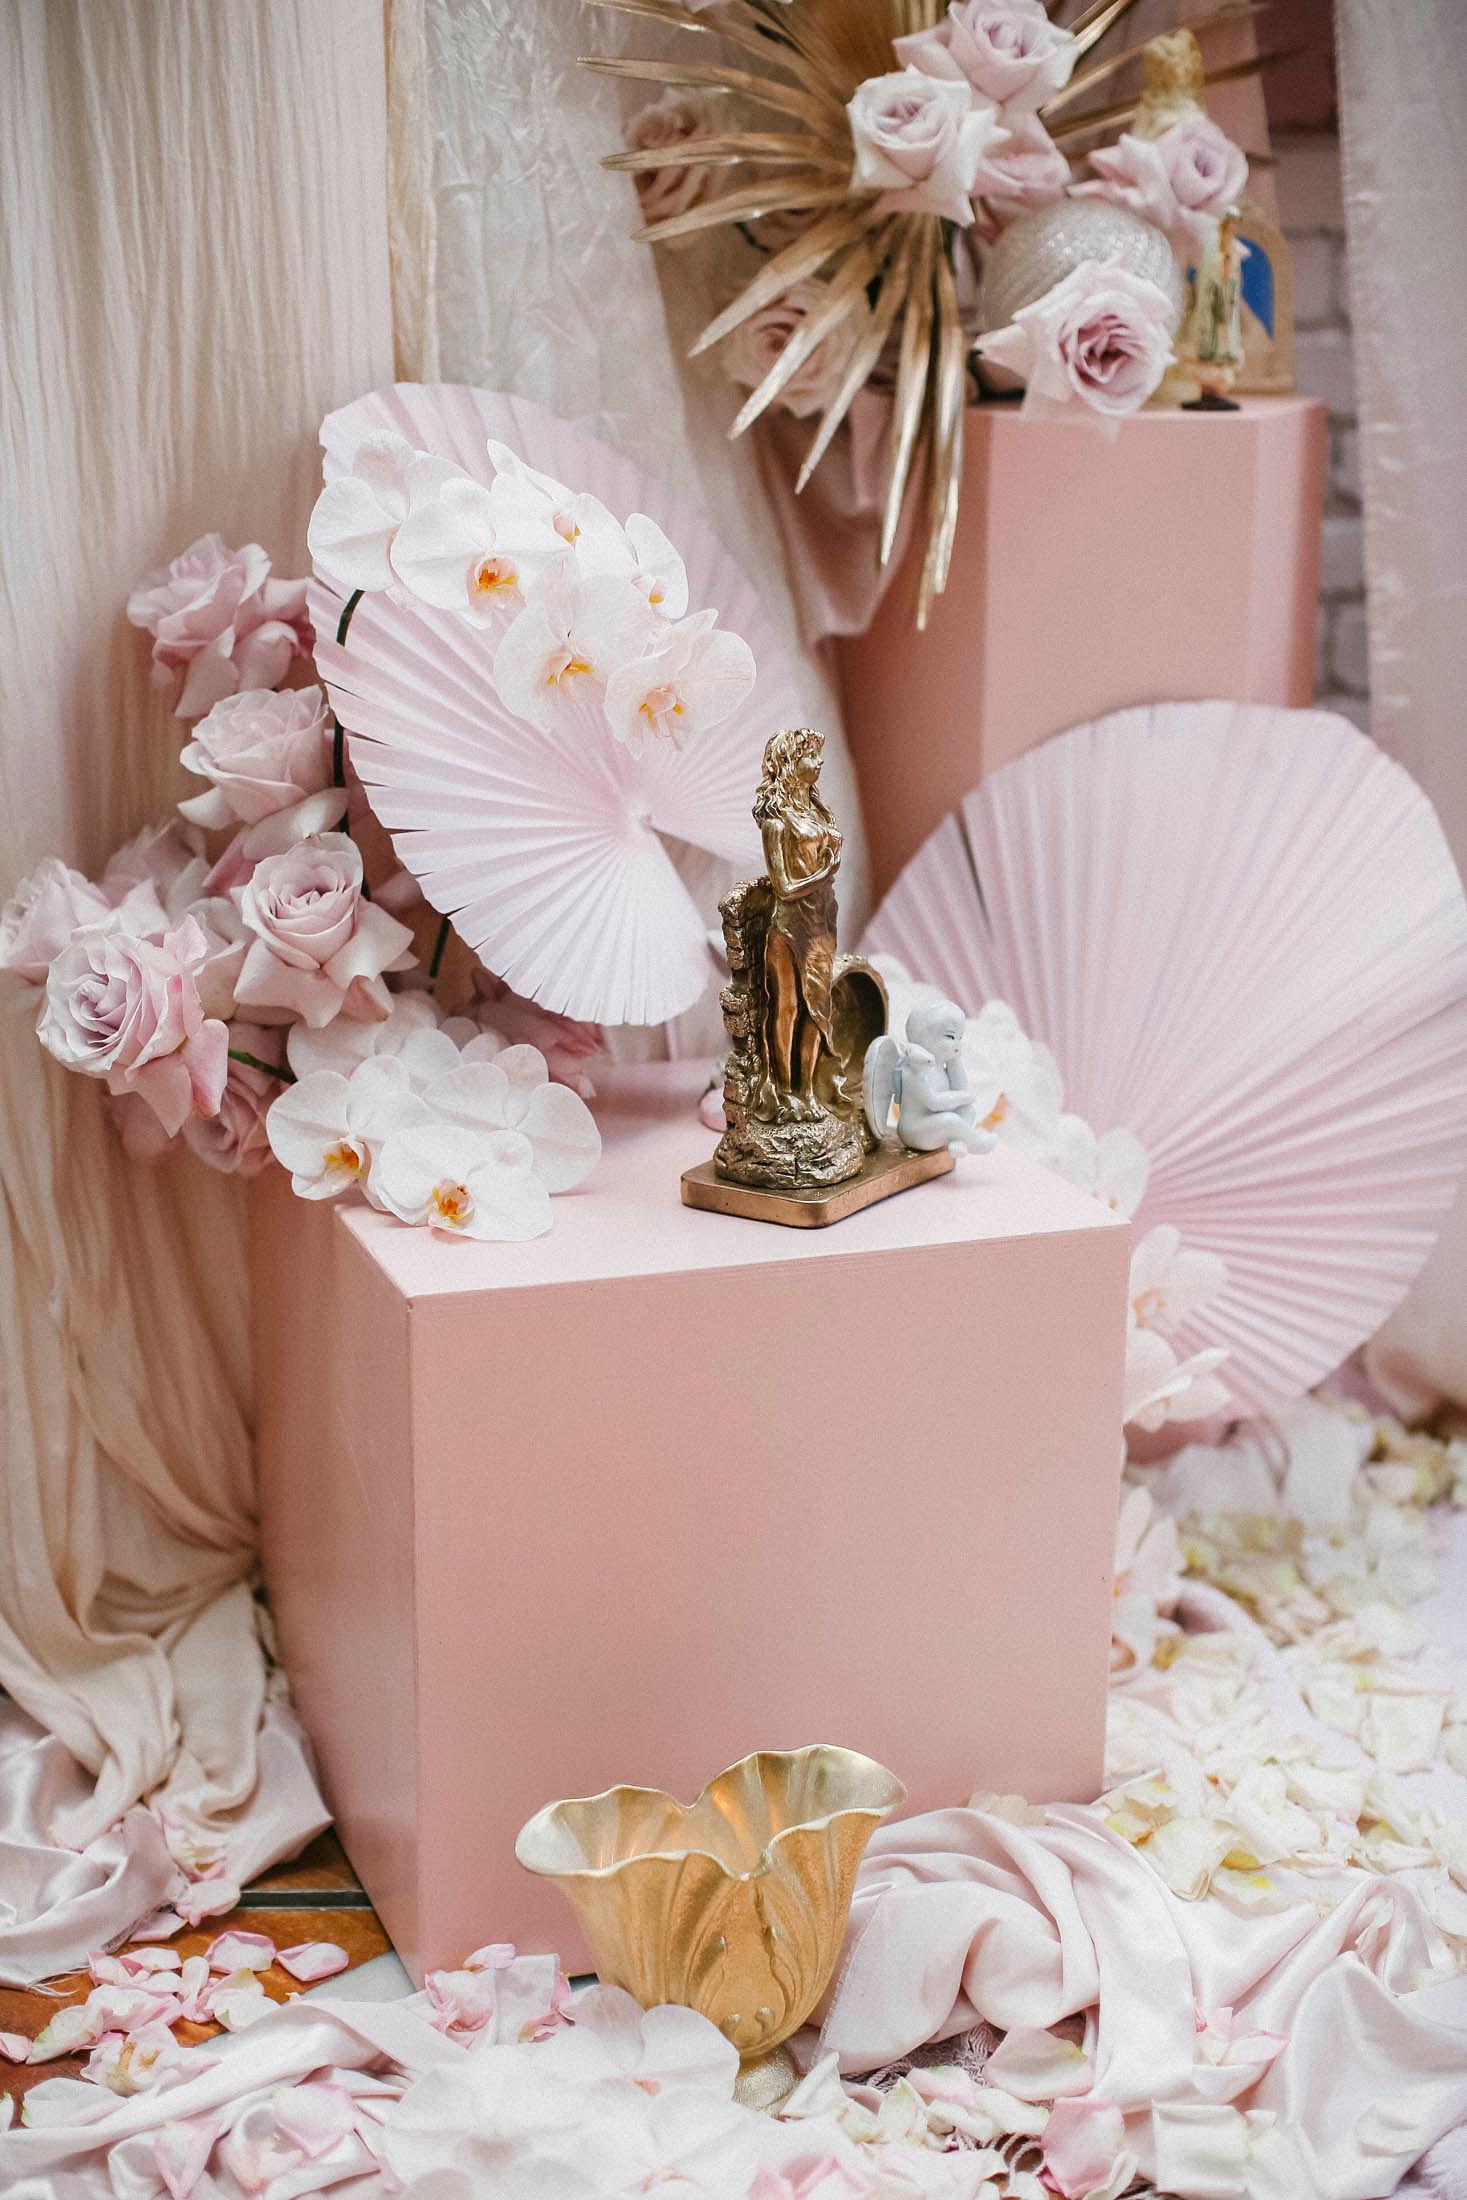 Lara + Cass Bohemian Blooms closeup pink box juliet's bedroom